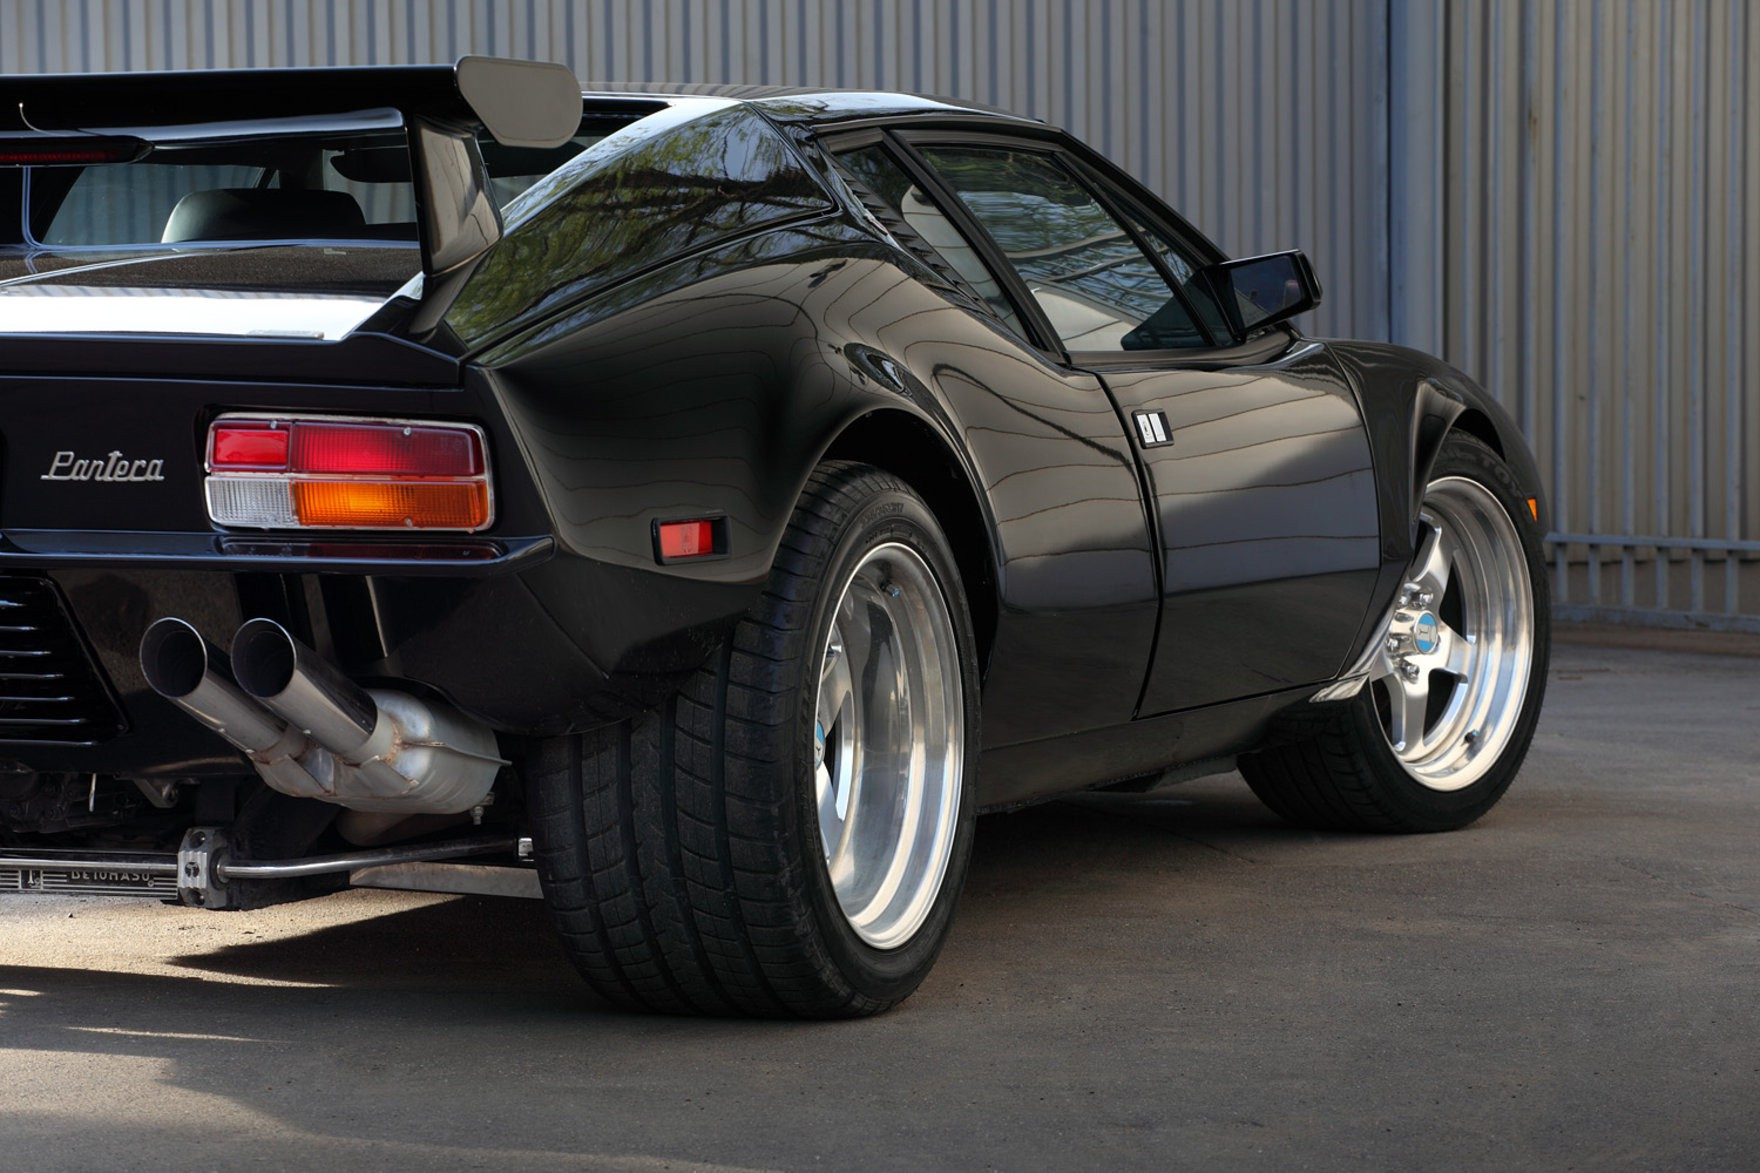 Bmw M1 For Sale >> Sale De Tomaso Pantera 5.8 MT / TopCar